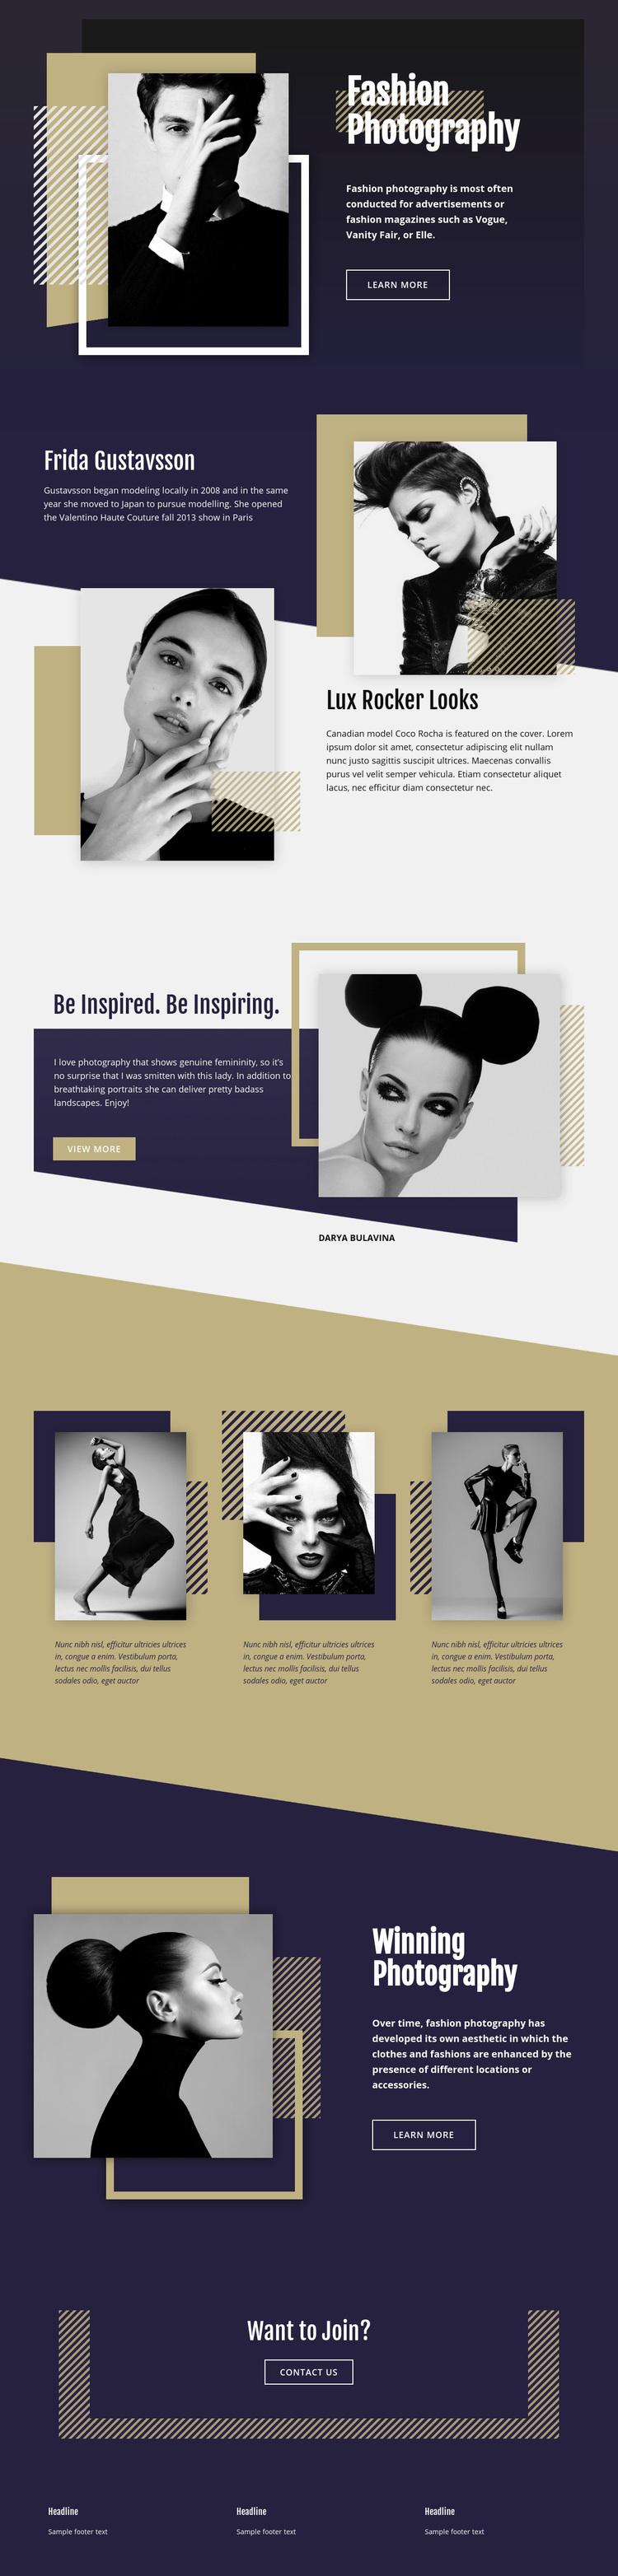 Fashion Photography Web Page Designer